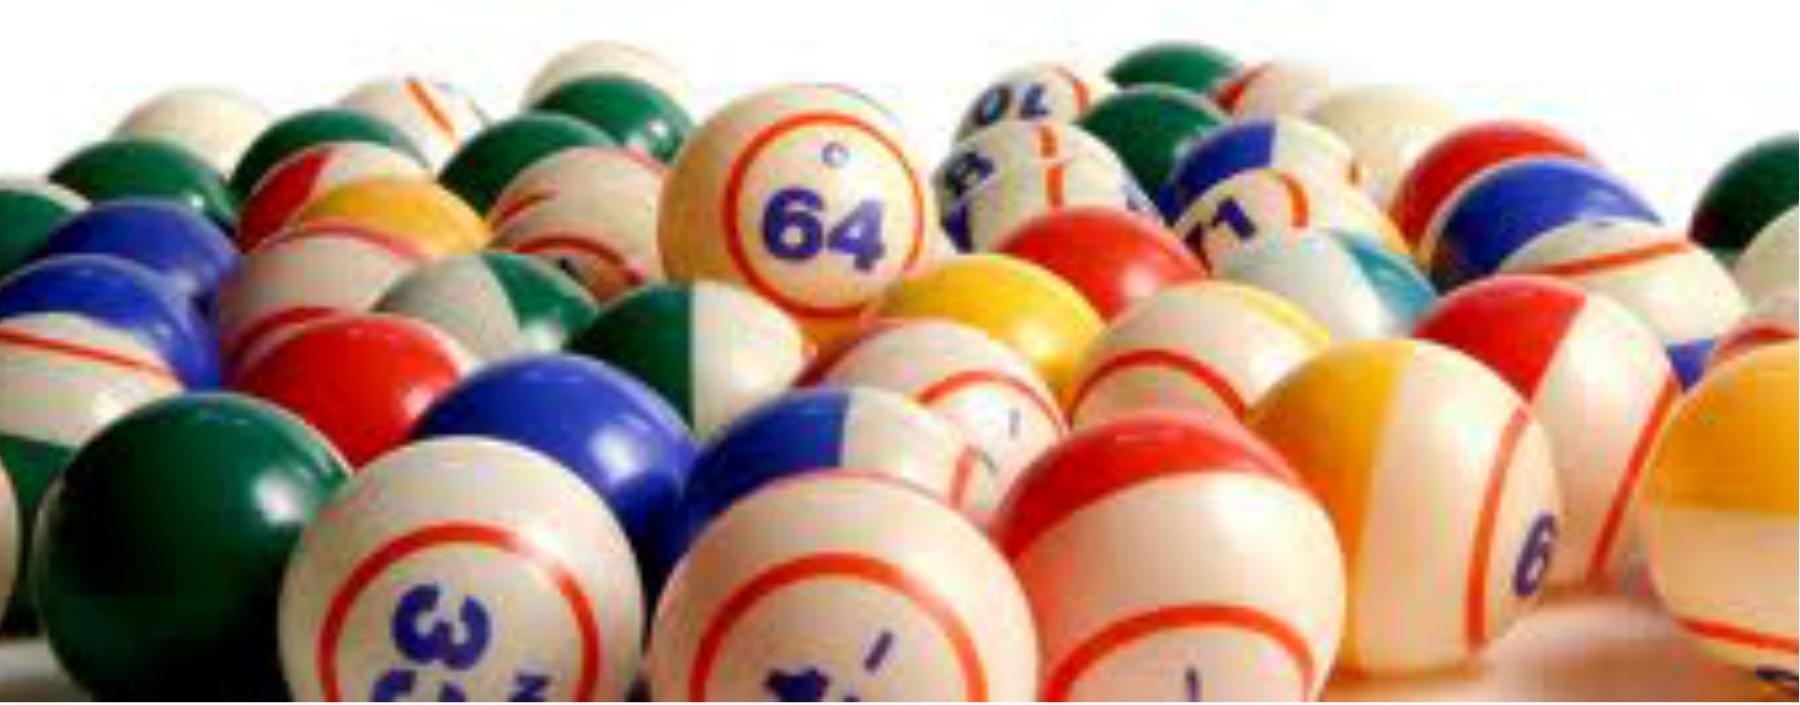 V2 bingo balls